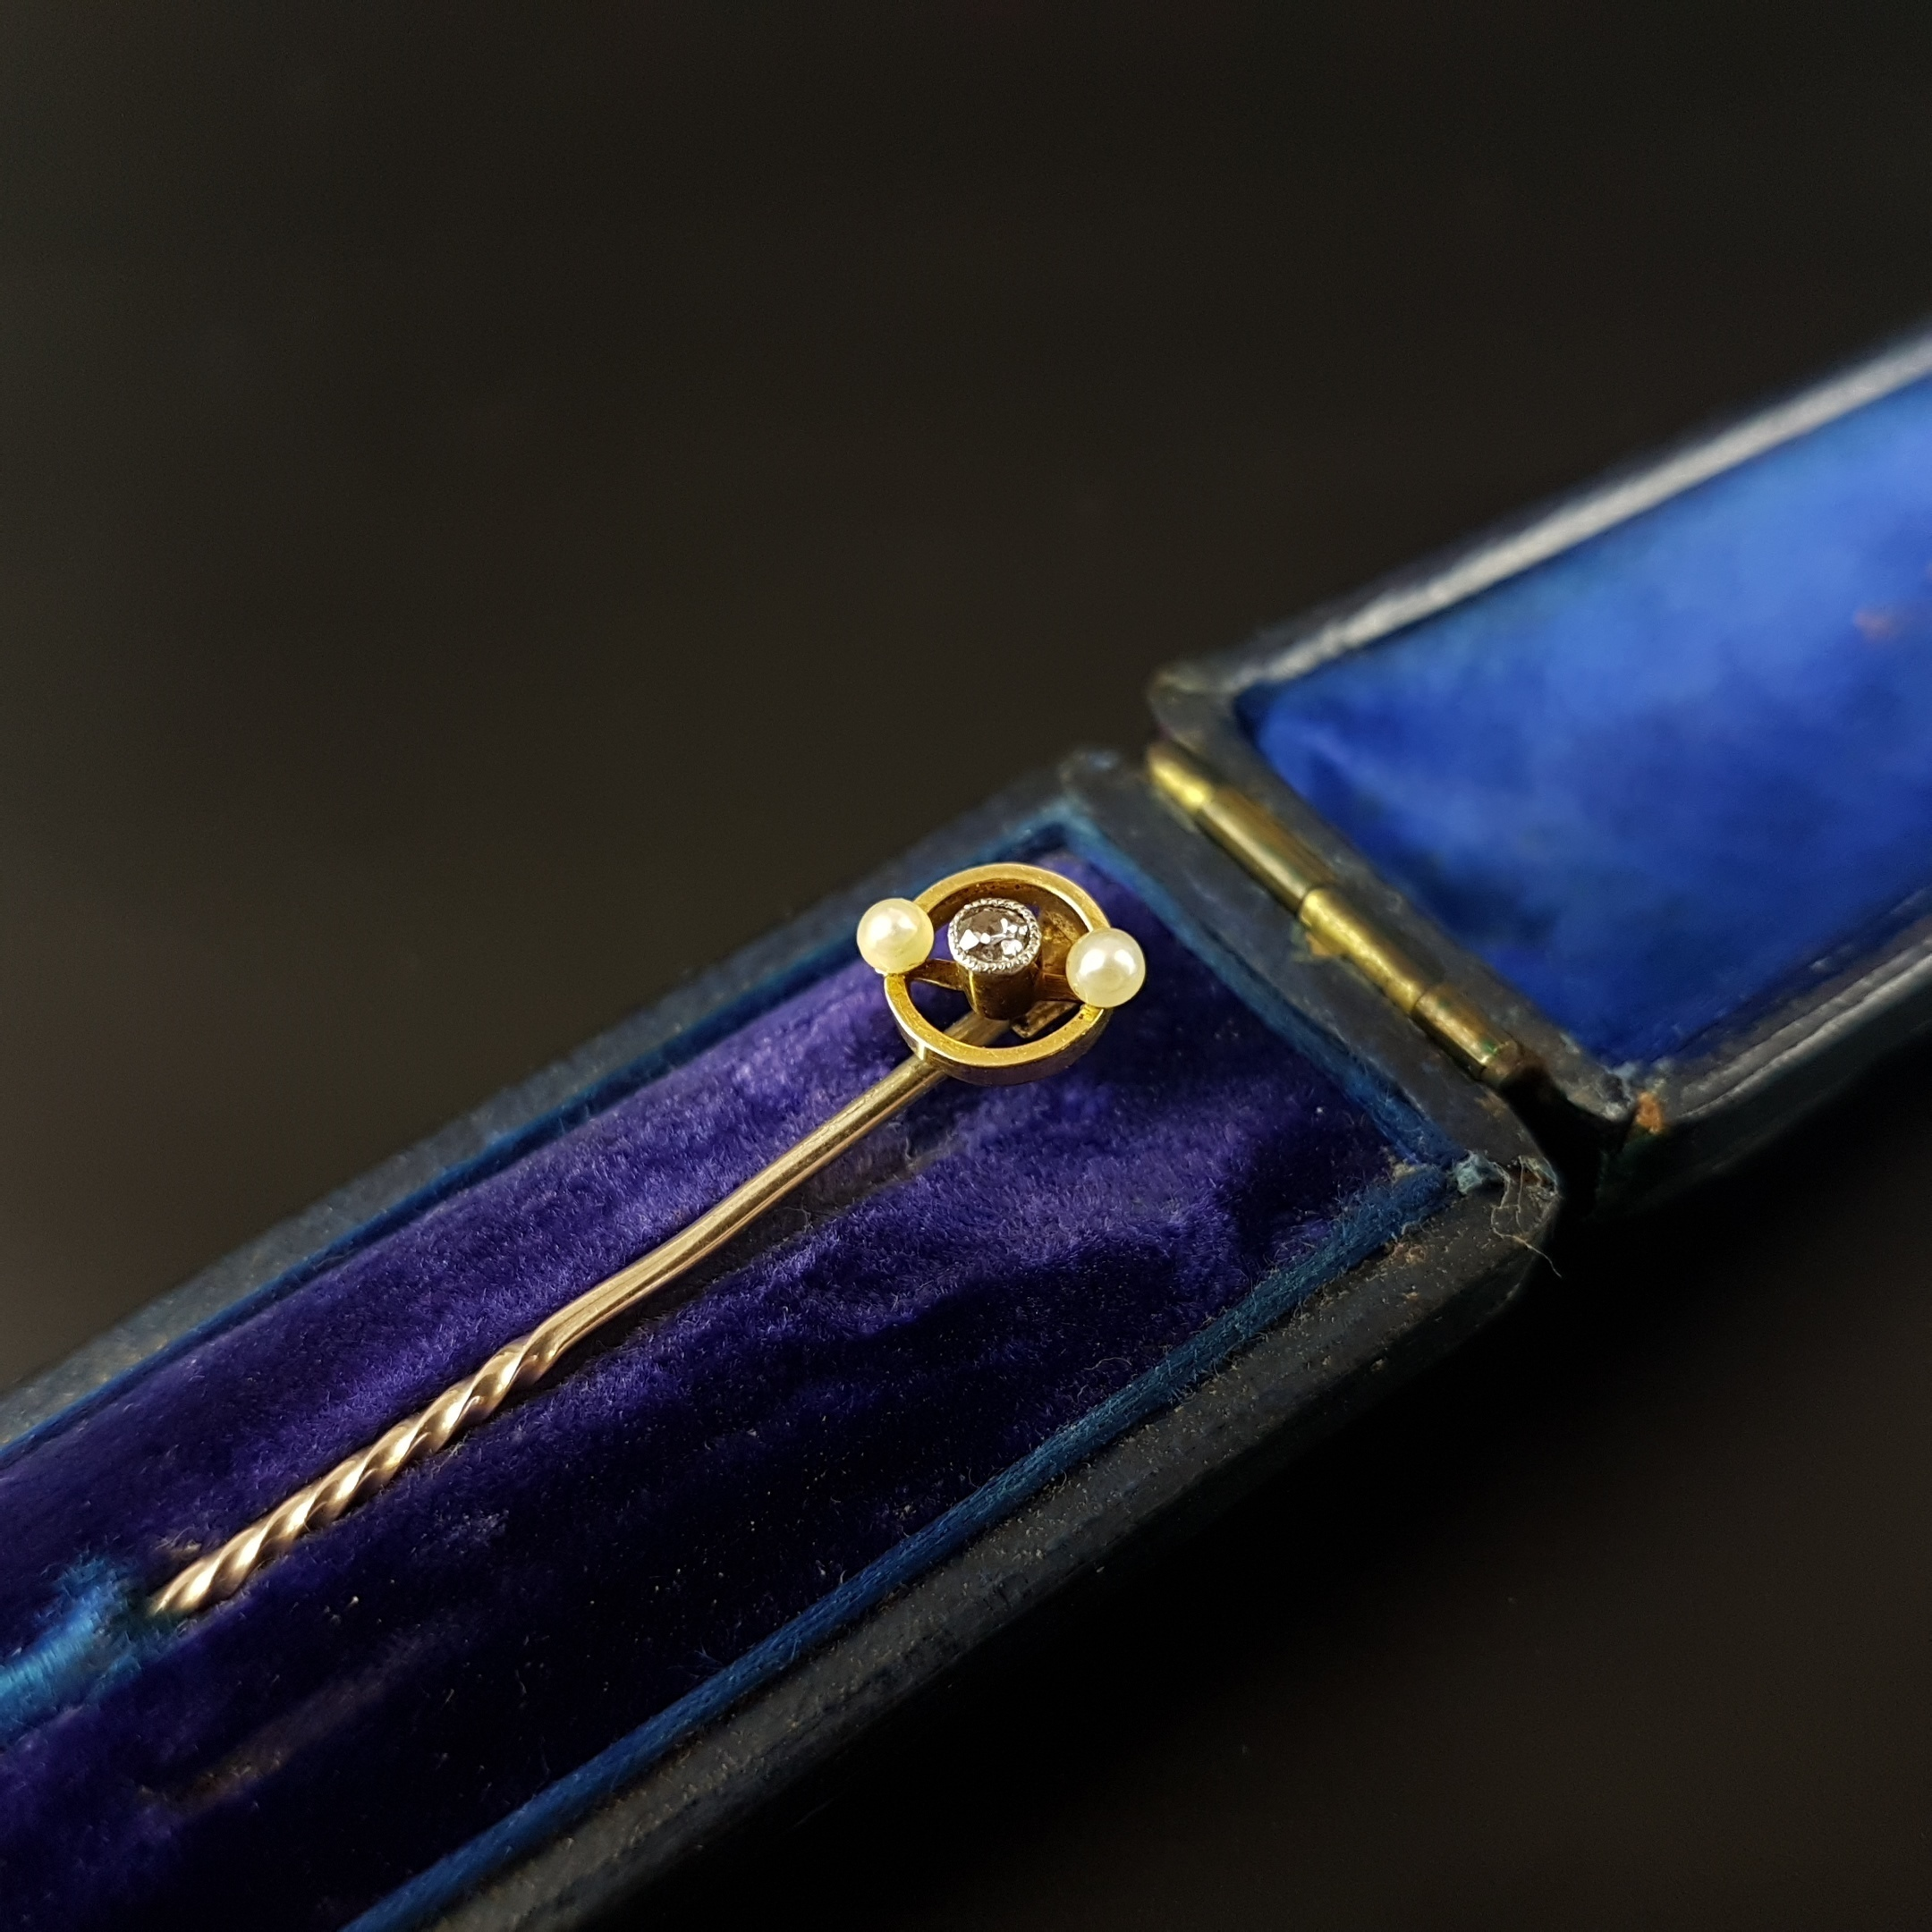 f4497030c71 Art Deco Edwardian 15ct Gold Platinum Seed Pearls Diamond Tie Pin Target  Stick Pin   Unknown   British   Vinterior